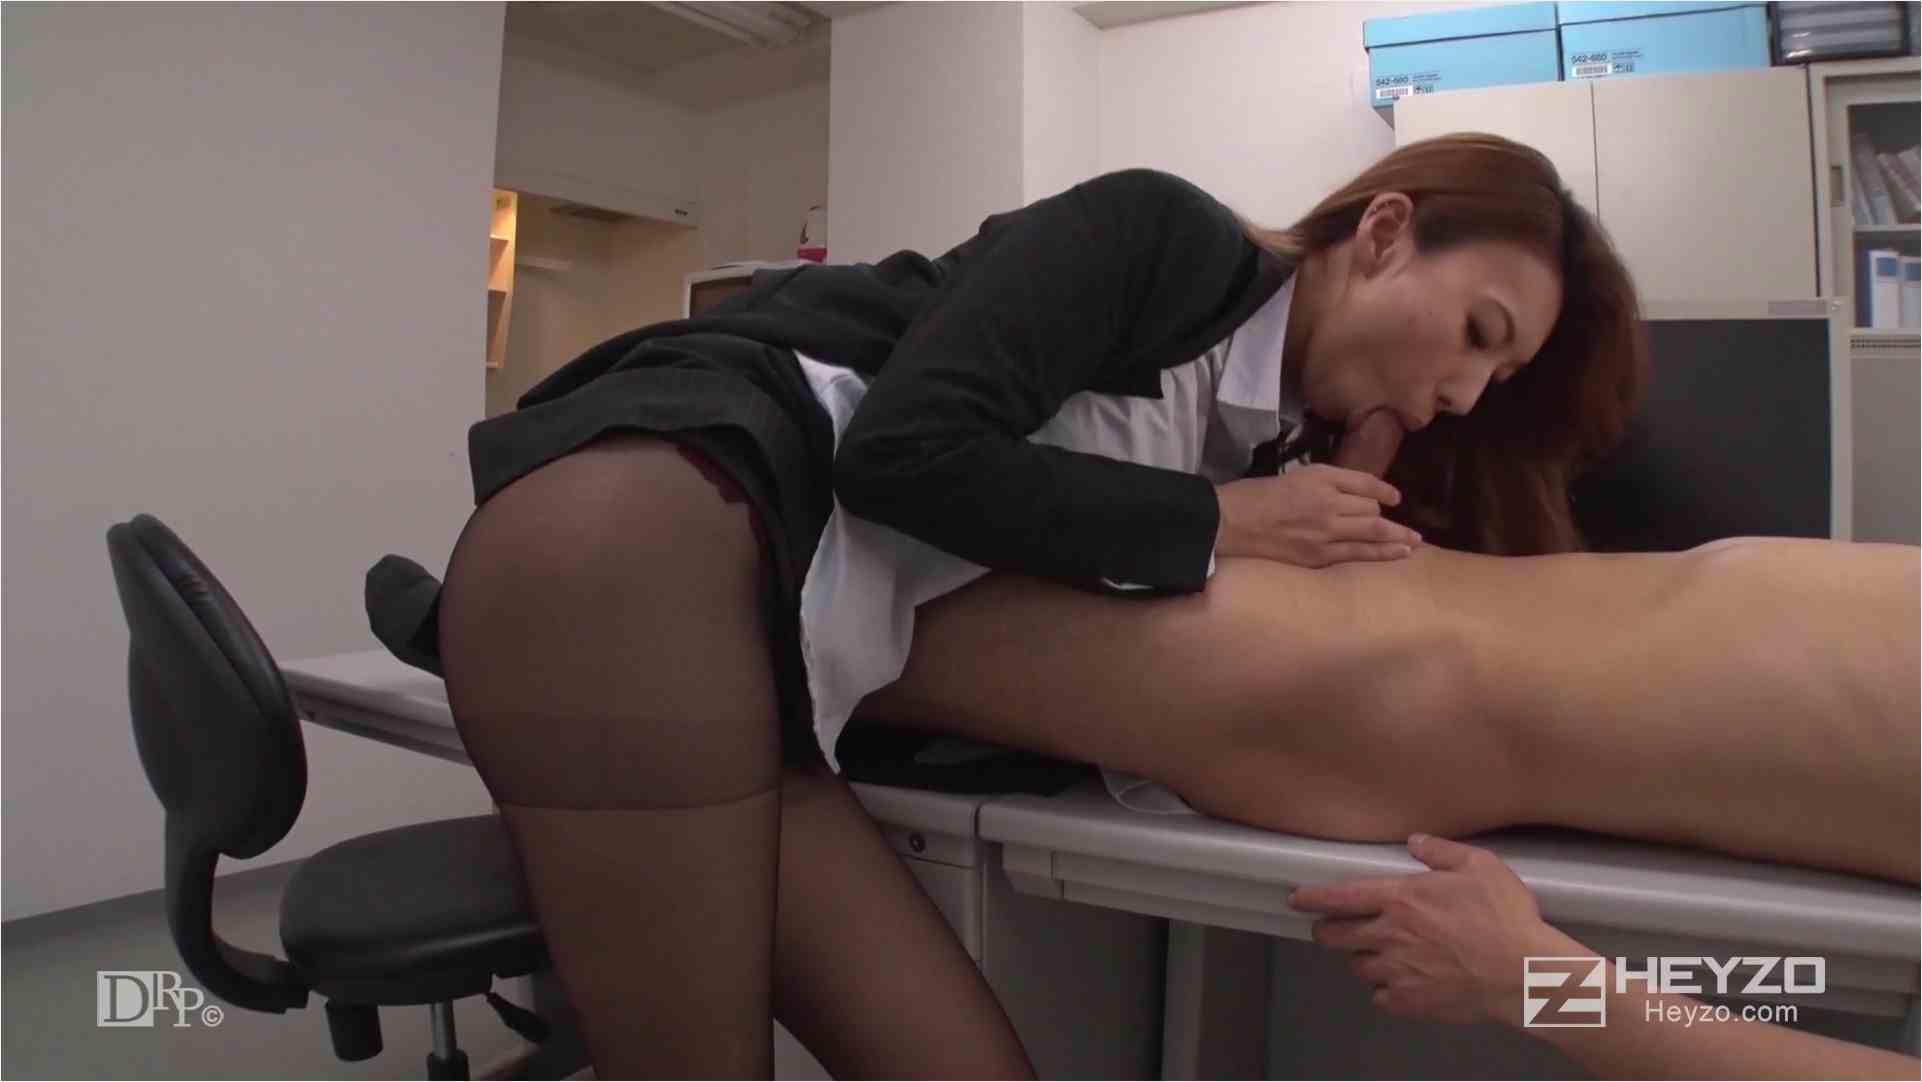 HEYZO-0603-美痴女~出世に女の武器を使う淫乱OL~